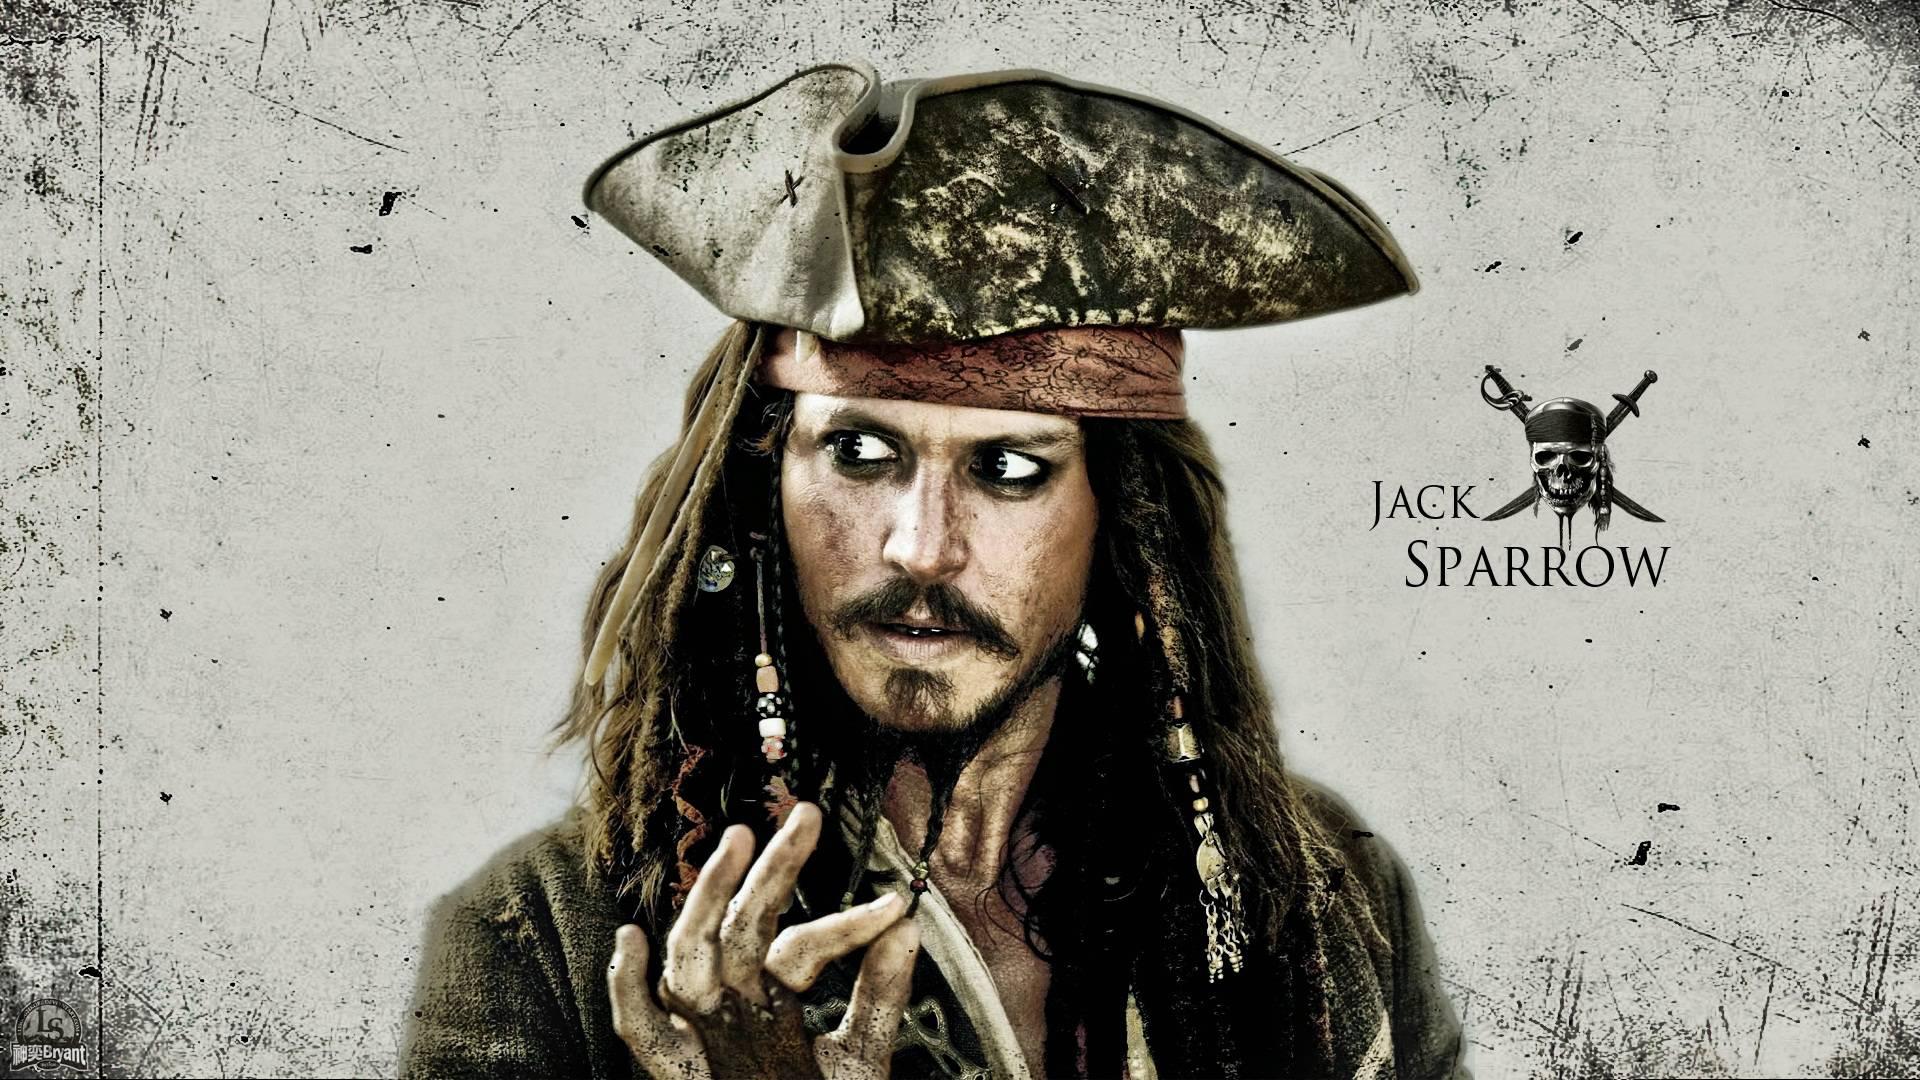 Captain-Jack-Sparrow-captain-jack-sparrow-33625293-1920-1080